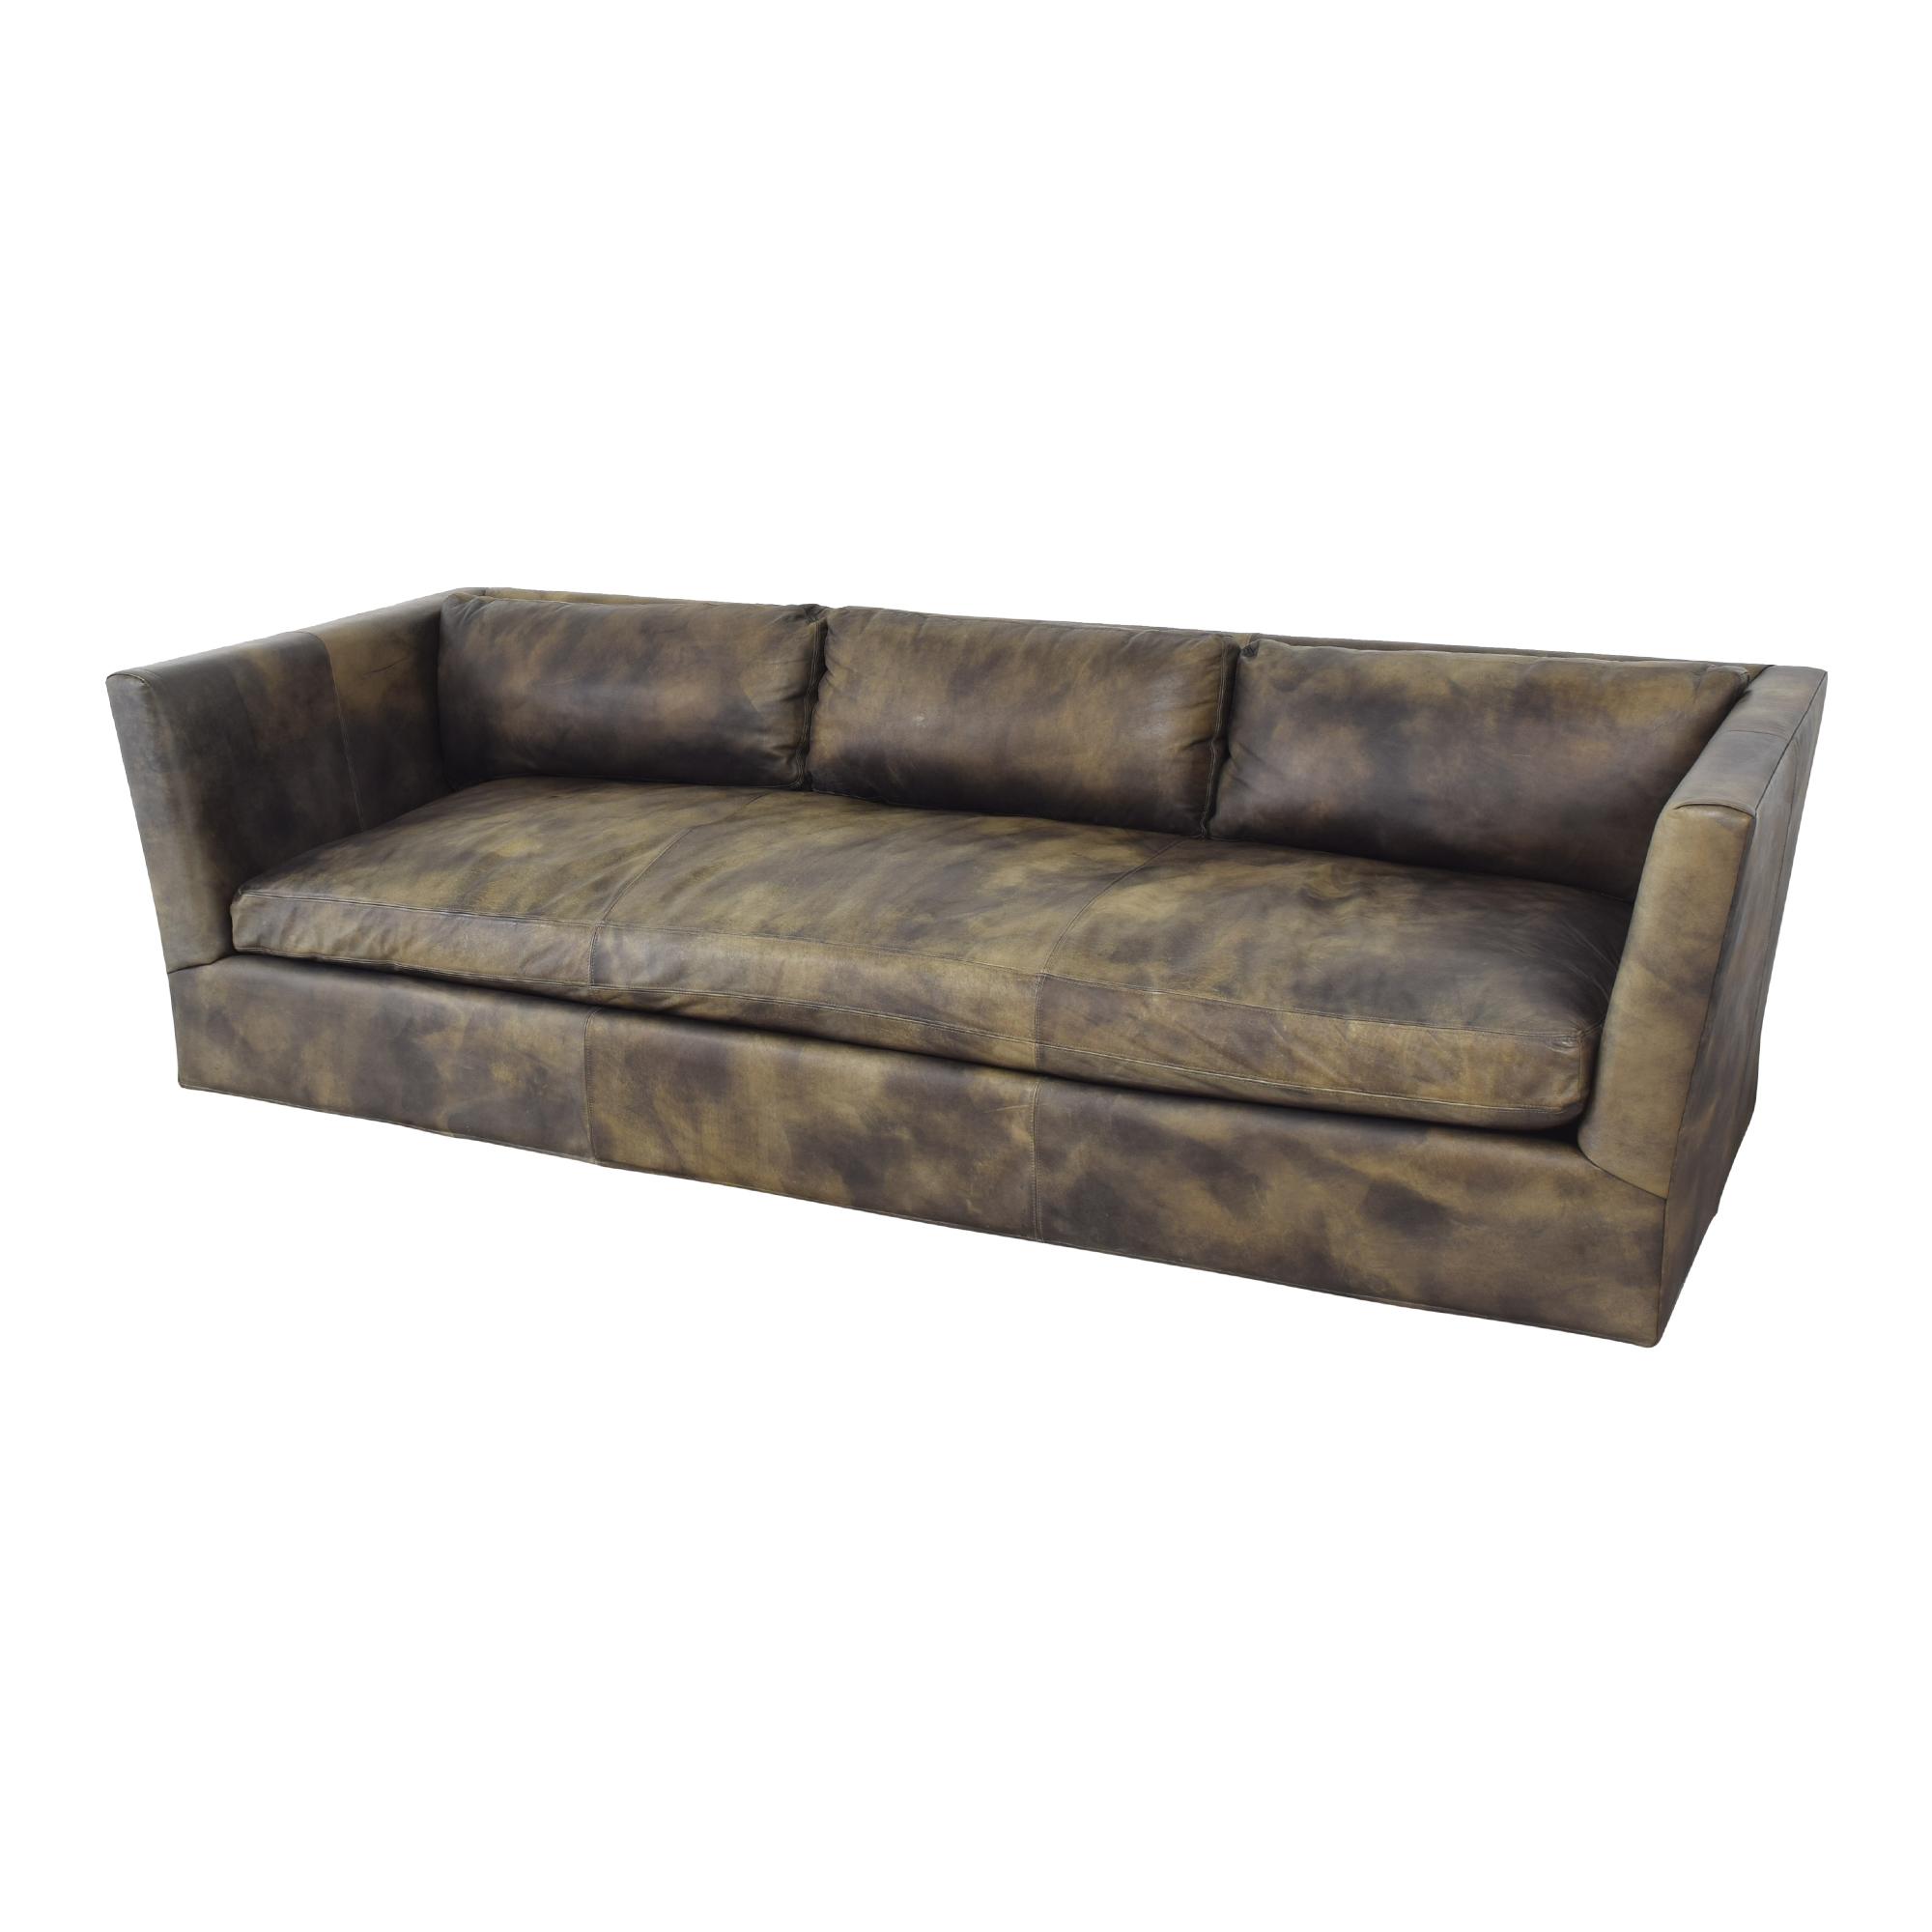 Restoration Hardware Restoration Hardware Custom Flared Arm Sofa on sale